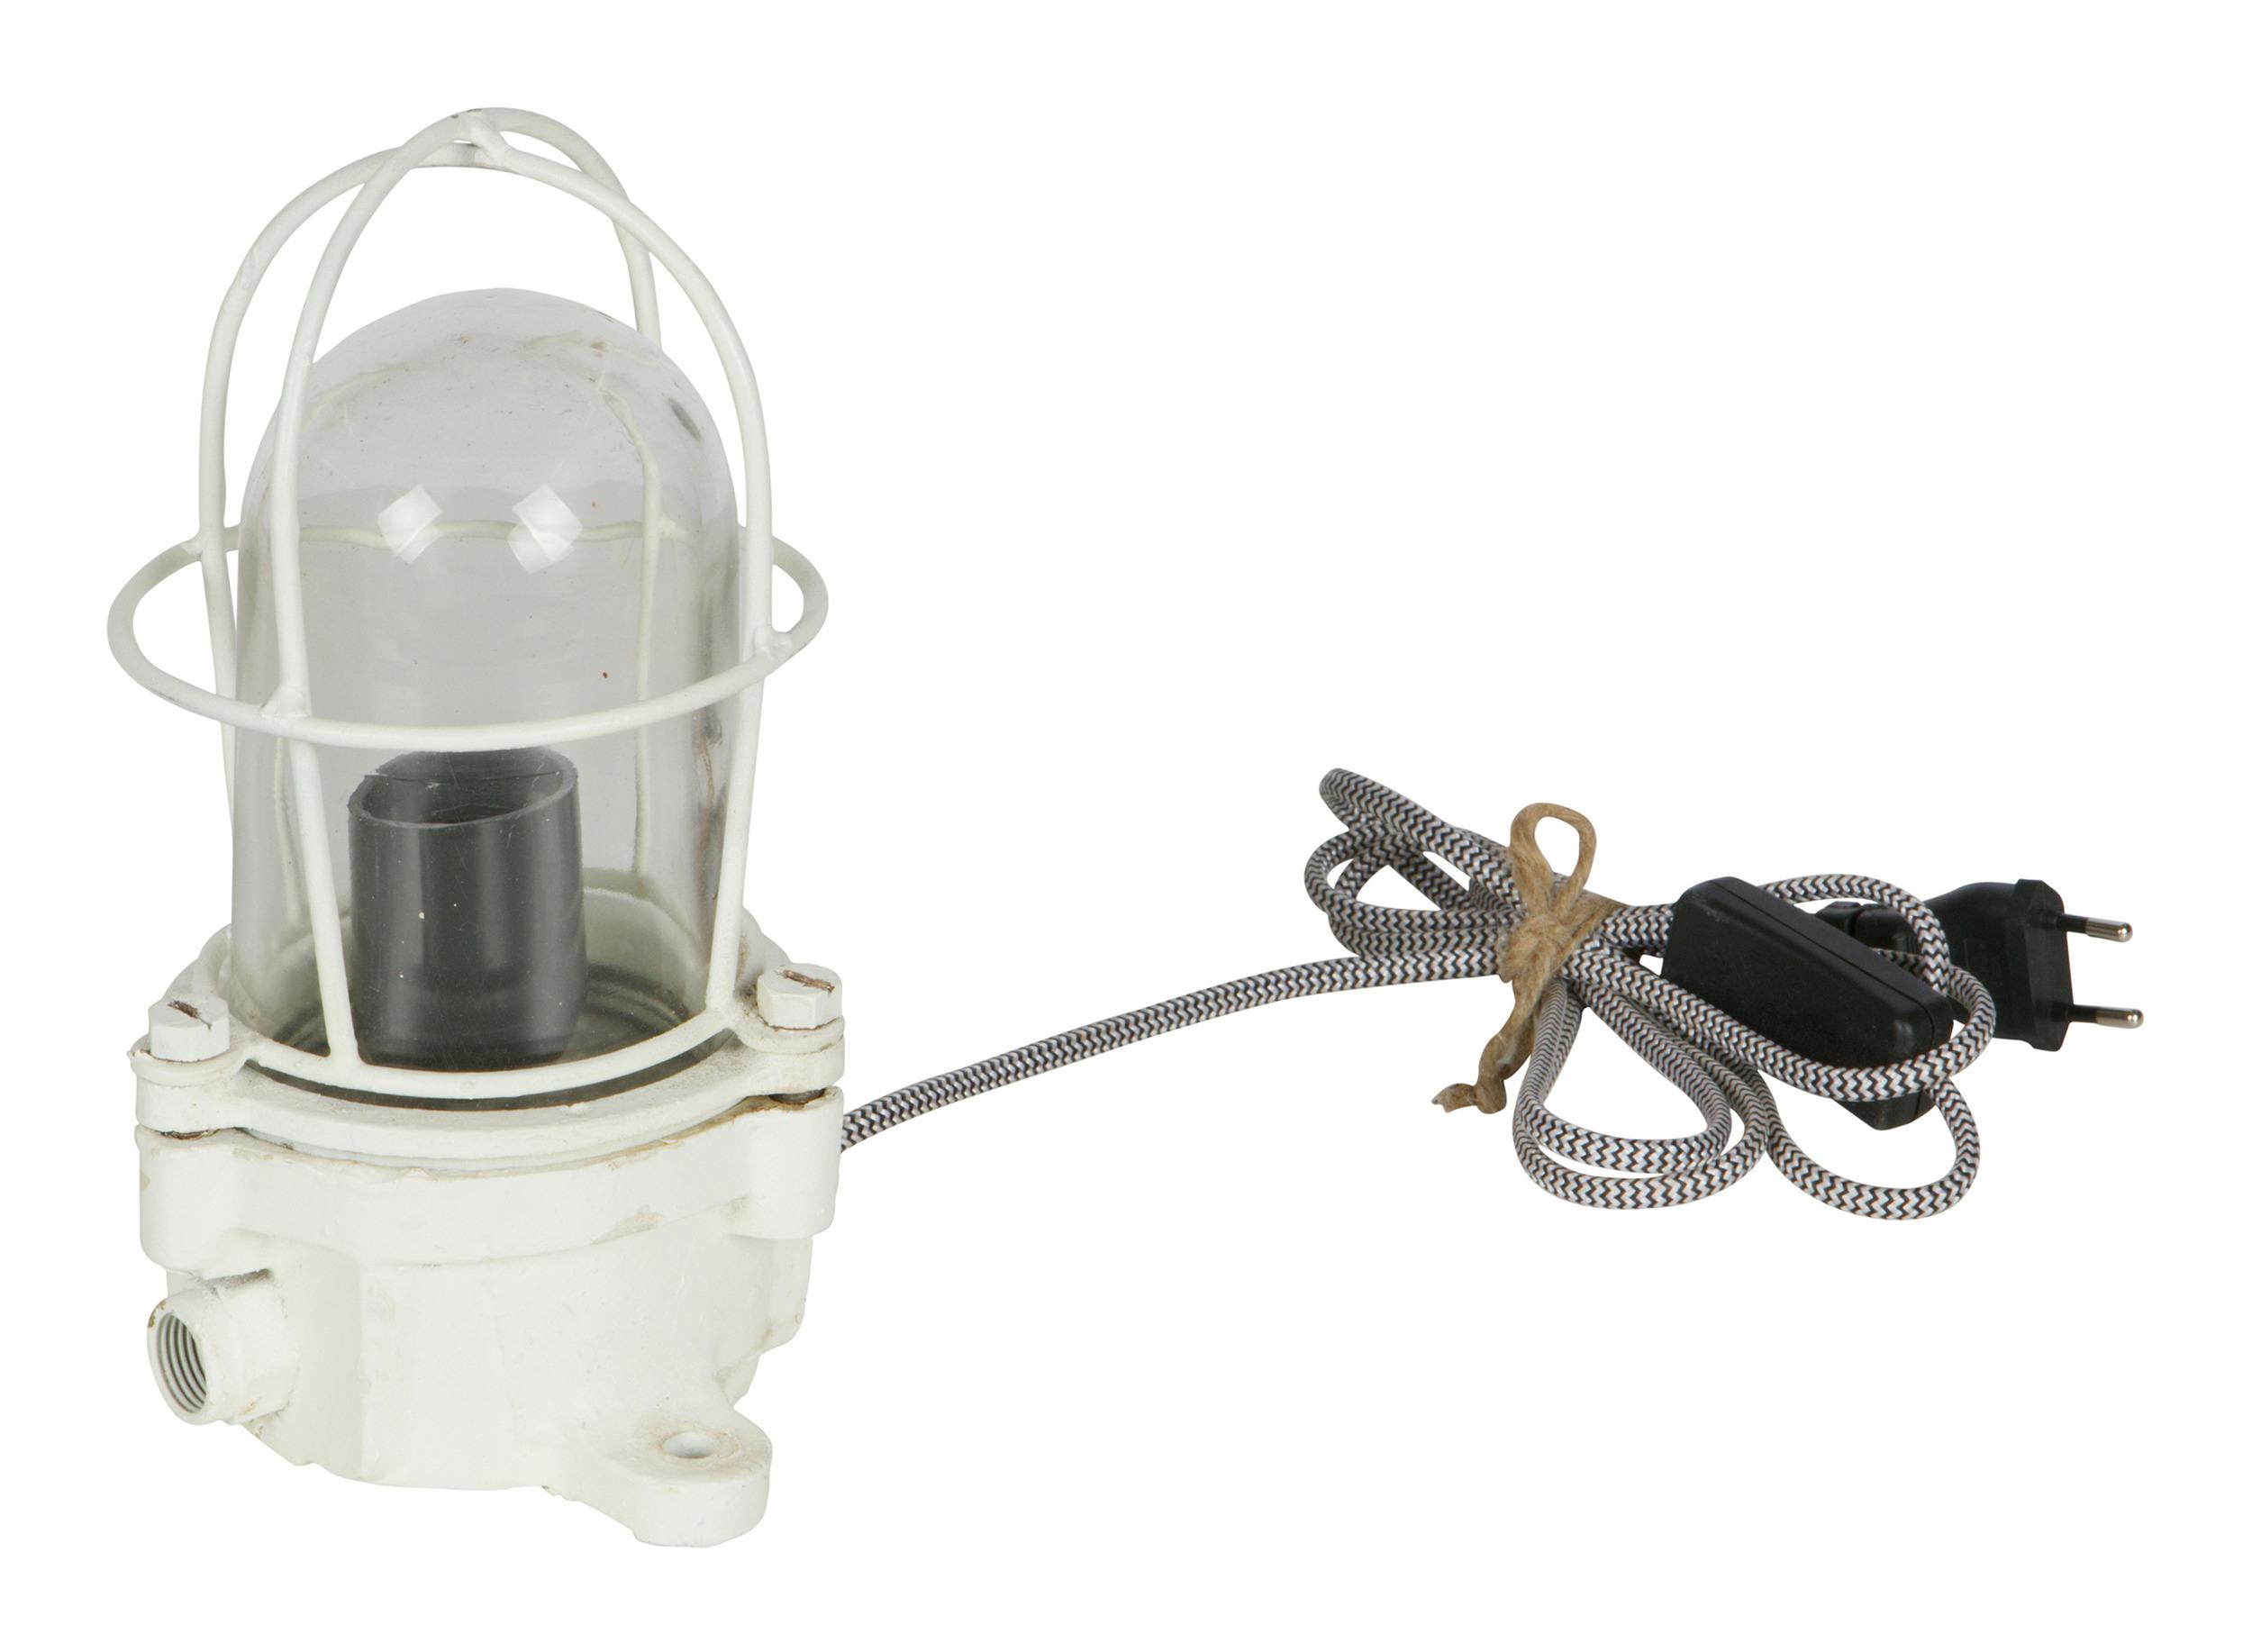 BePureHome Tafellamp 'Shiplight' 15 x 15cm, kleur Wit korting